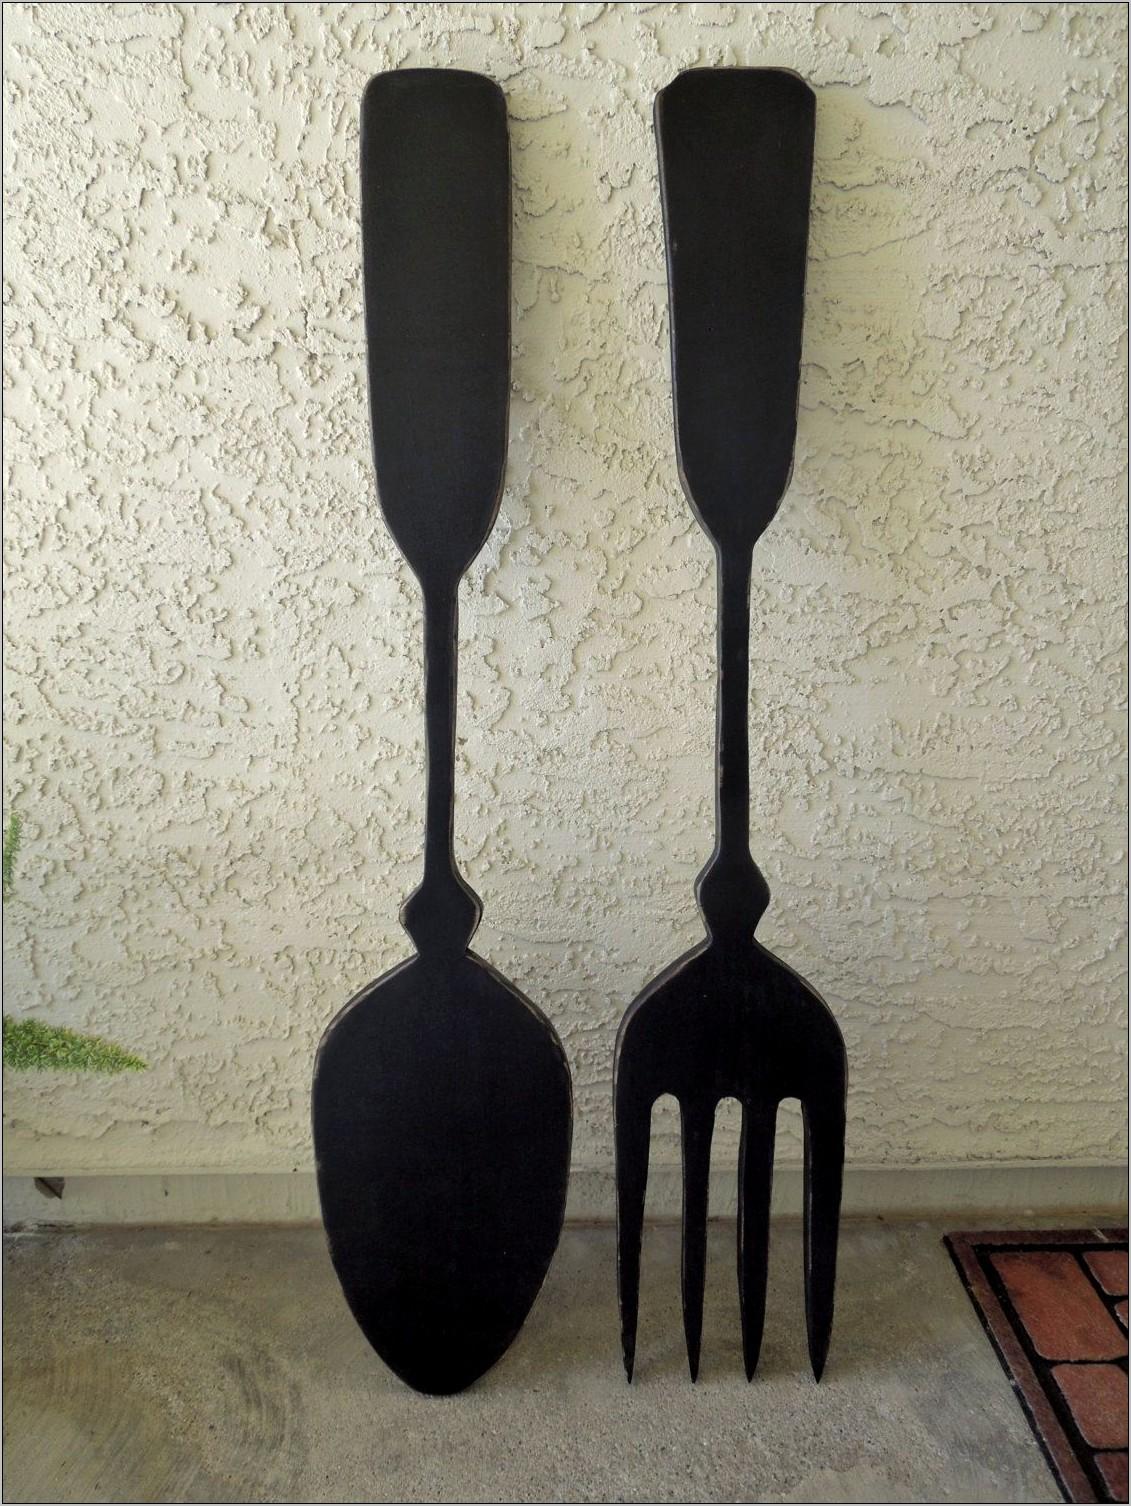 Big Spoon Kitchen Decor